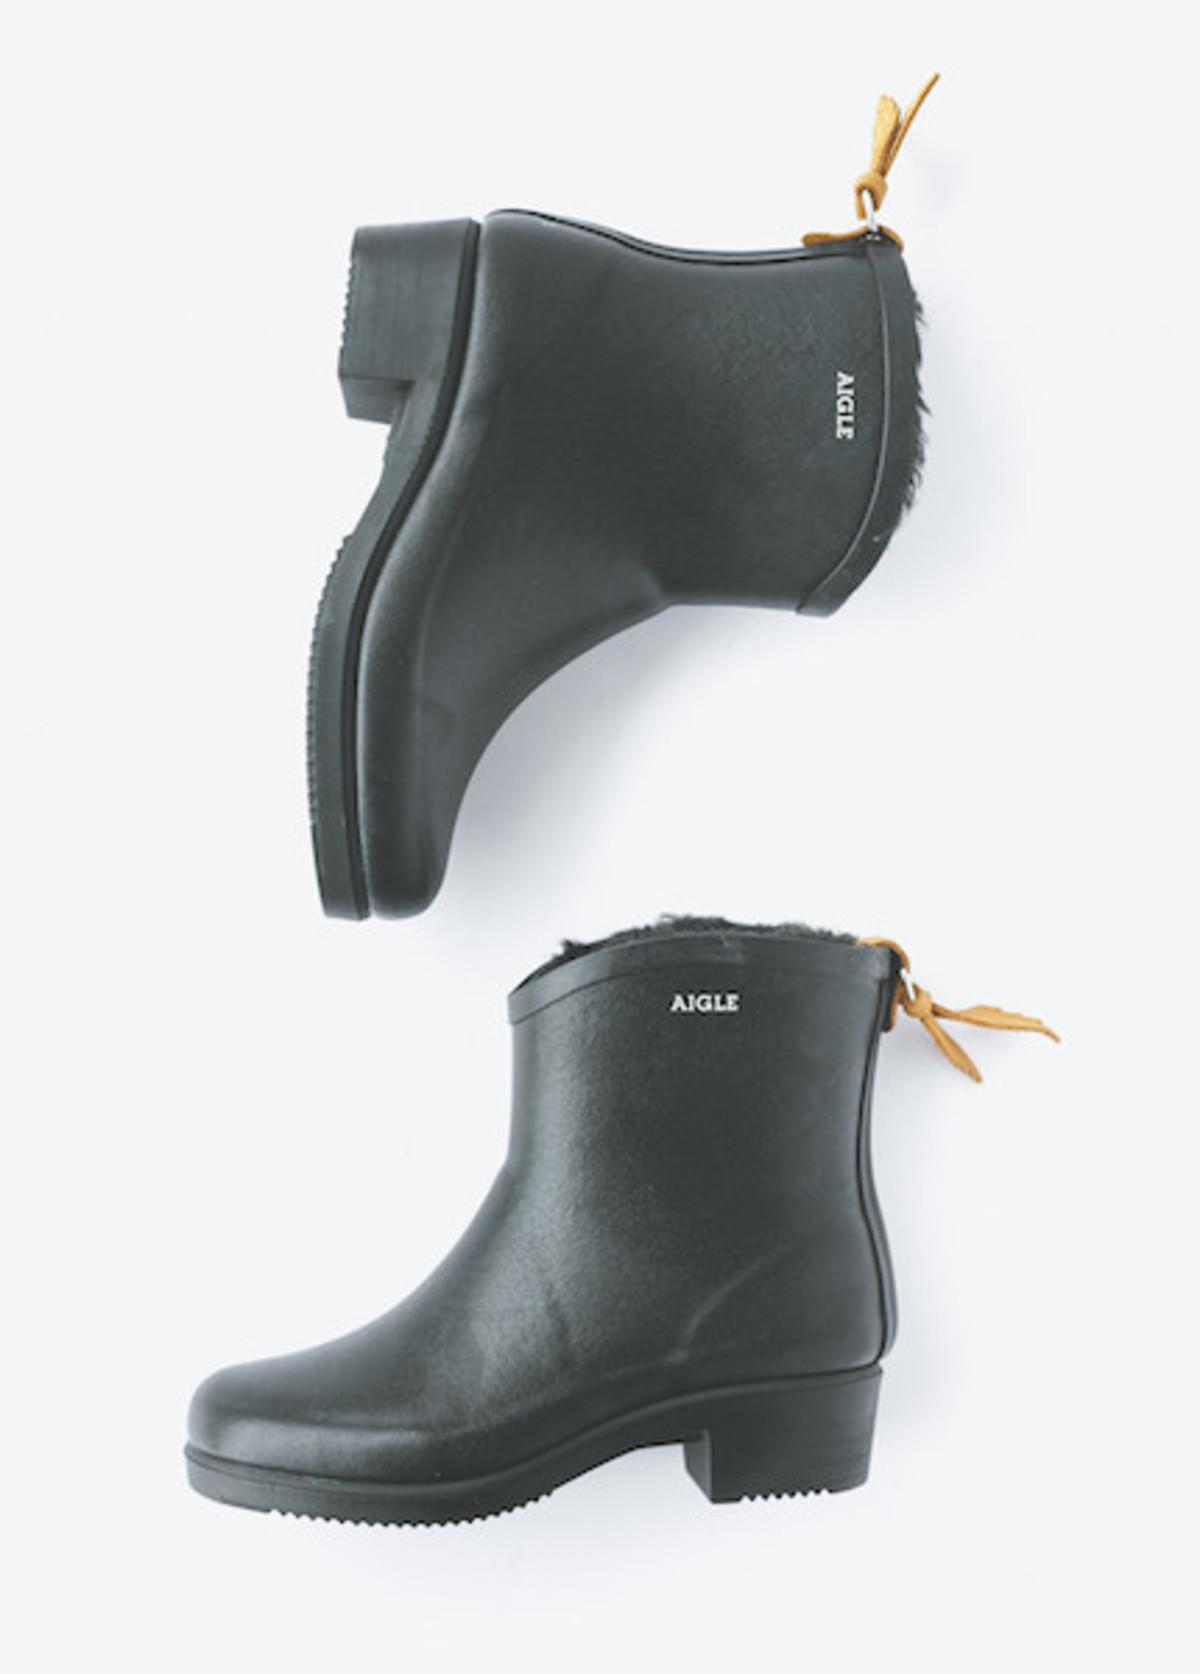 aigle miss juliette bottillon fur in noir | garmentory